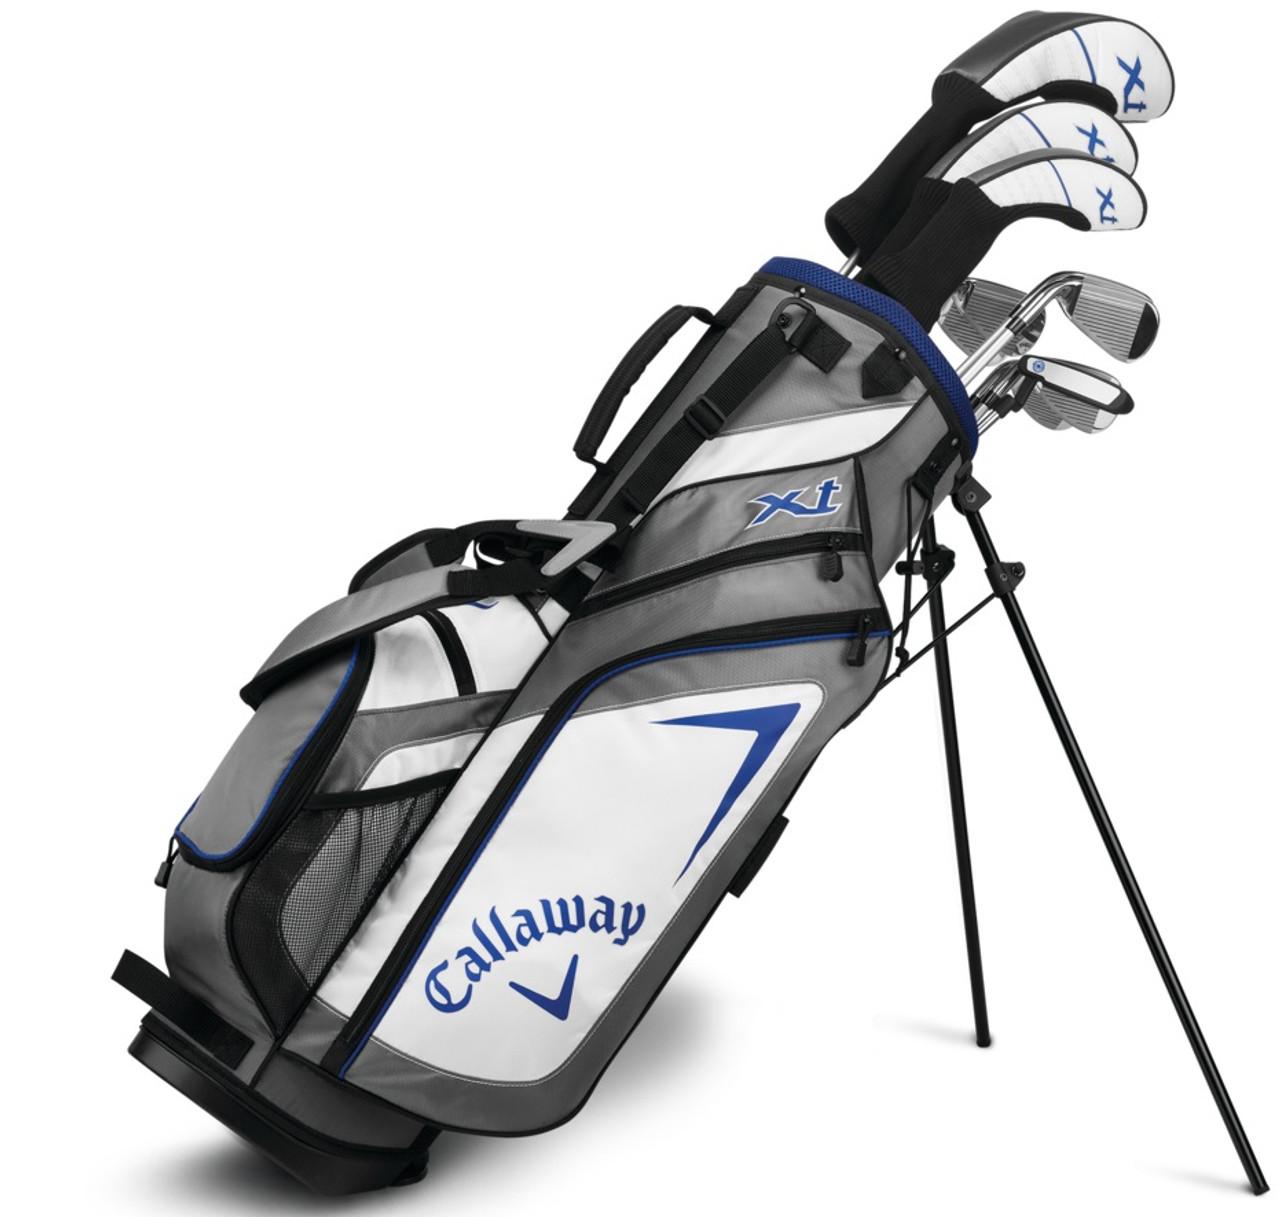 Callaway Golf Xt Junior Teen 10 Piece Set With Bag Rockbottomgolf Com